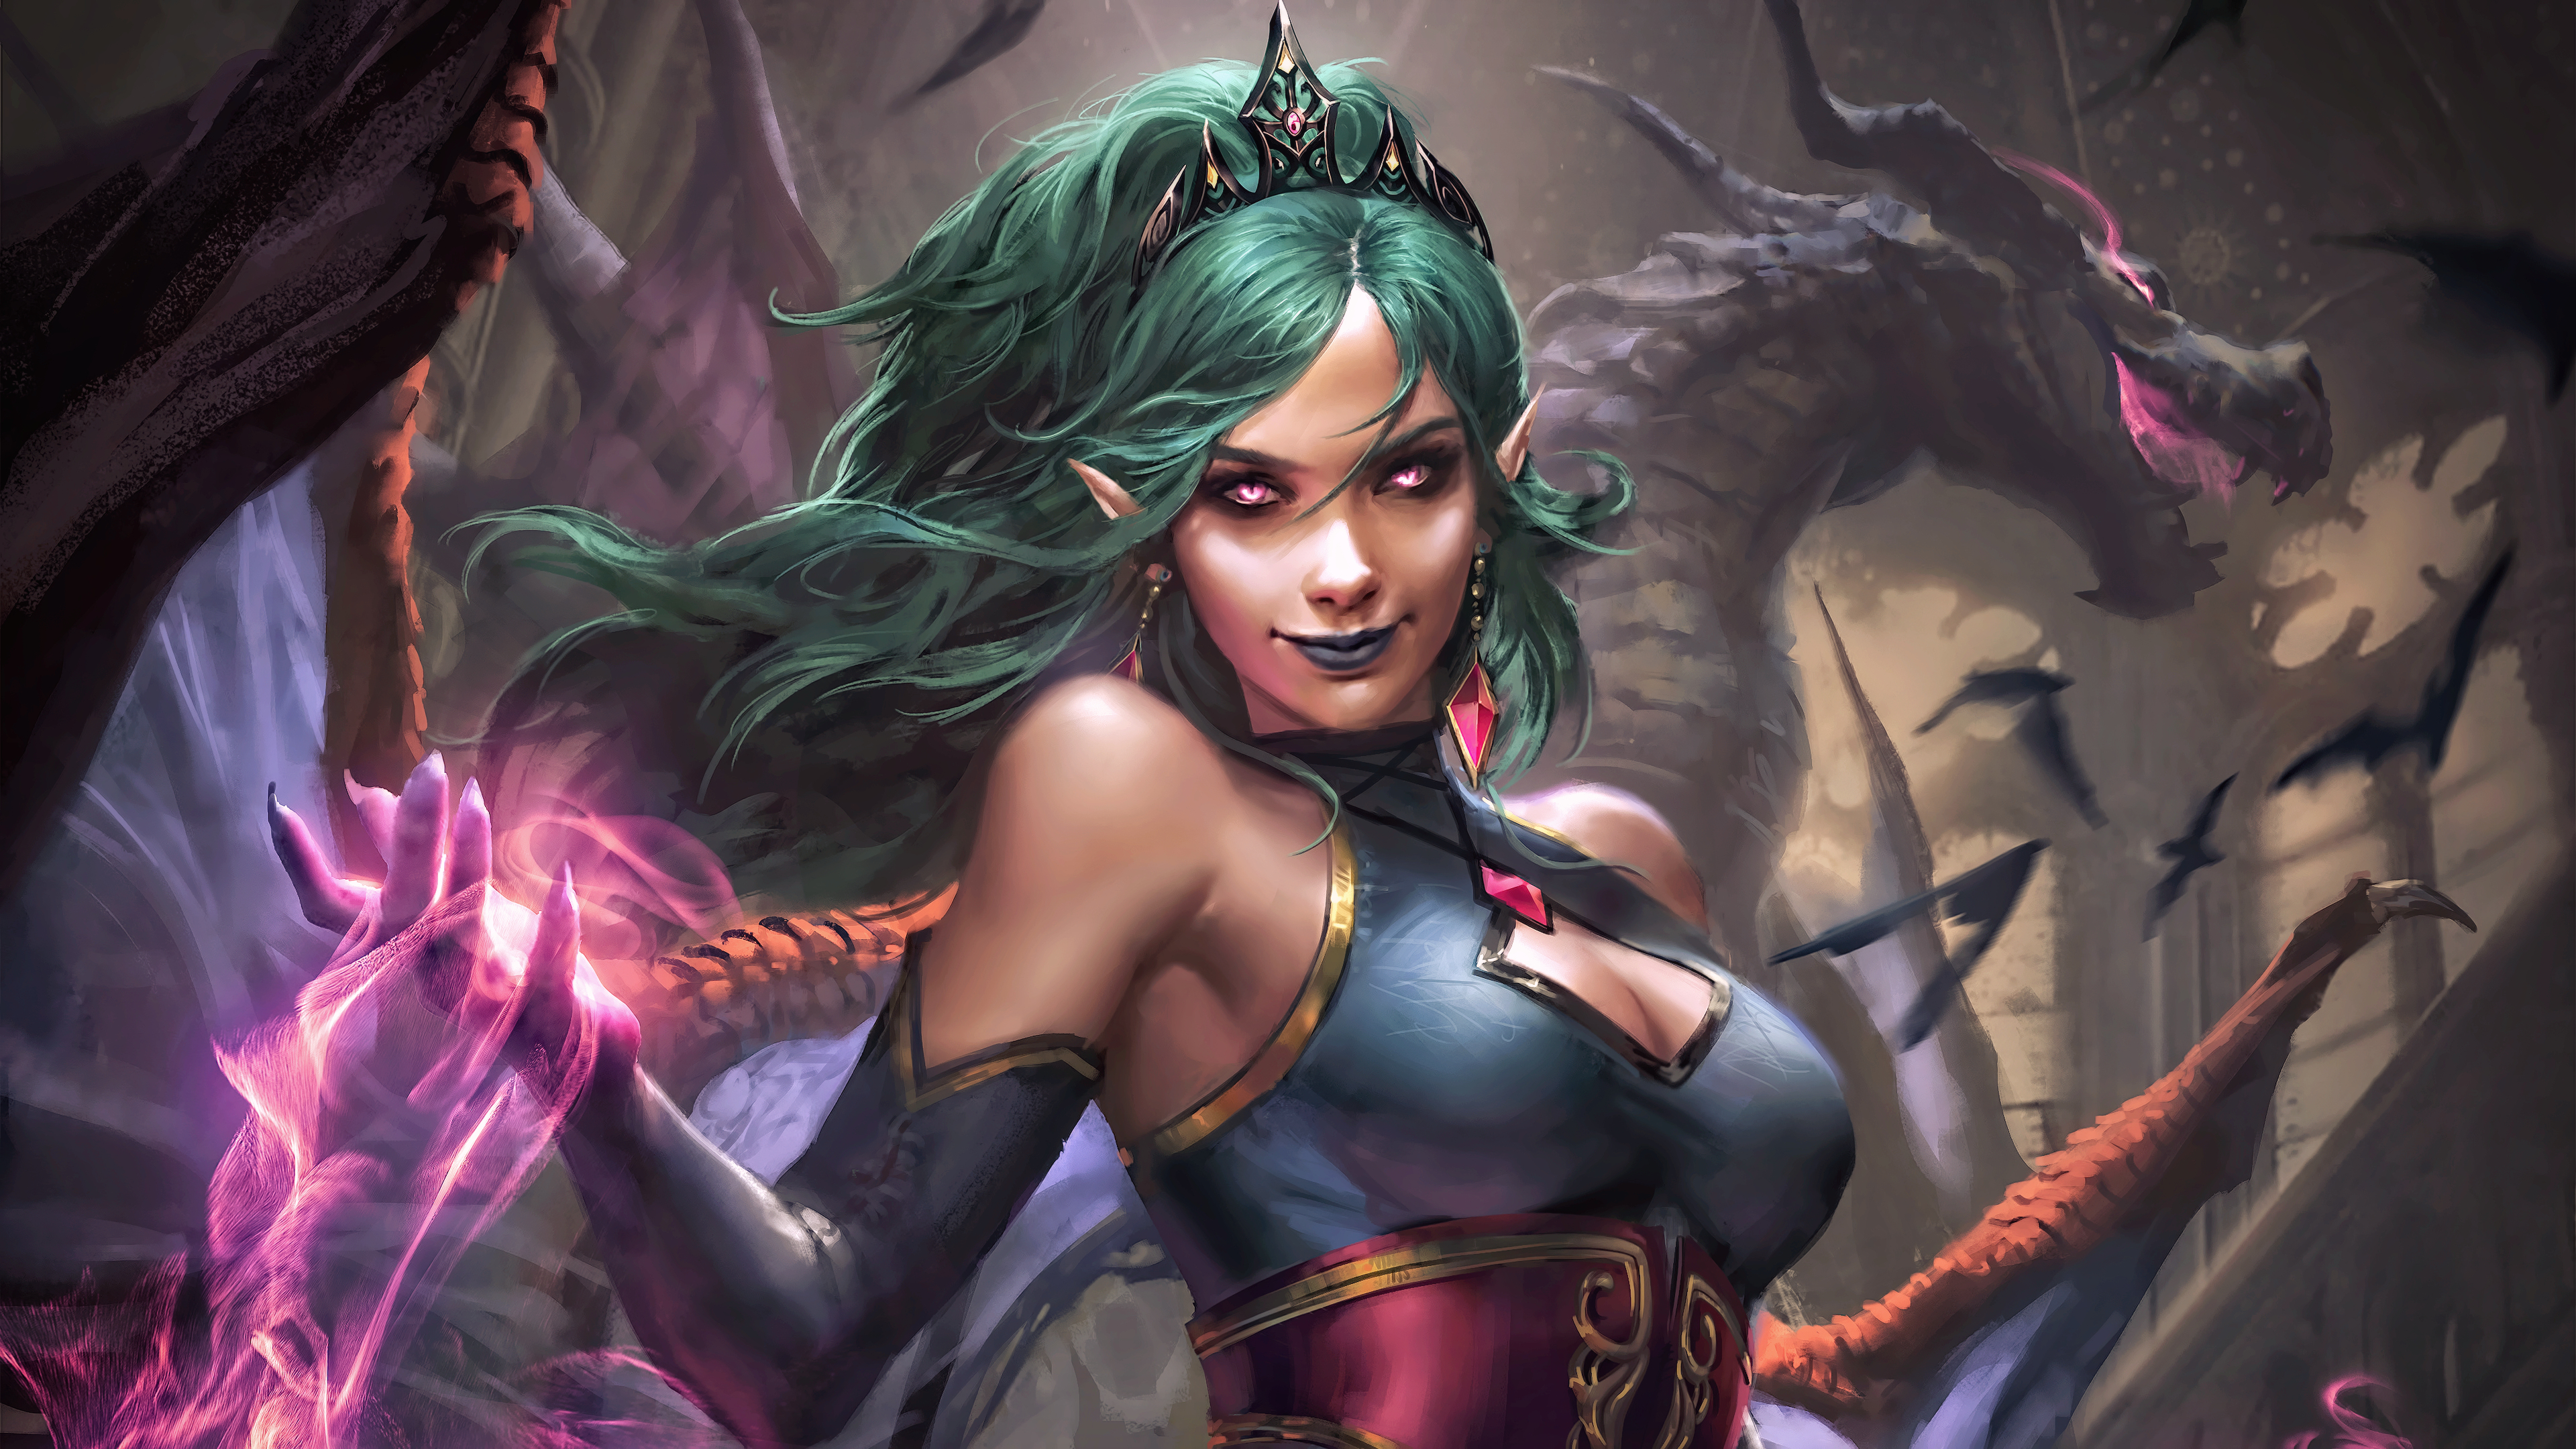 General 3840x2160 digital art concept art artwork fantasy art fan art fantasy girl women painting vampires creature dragon